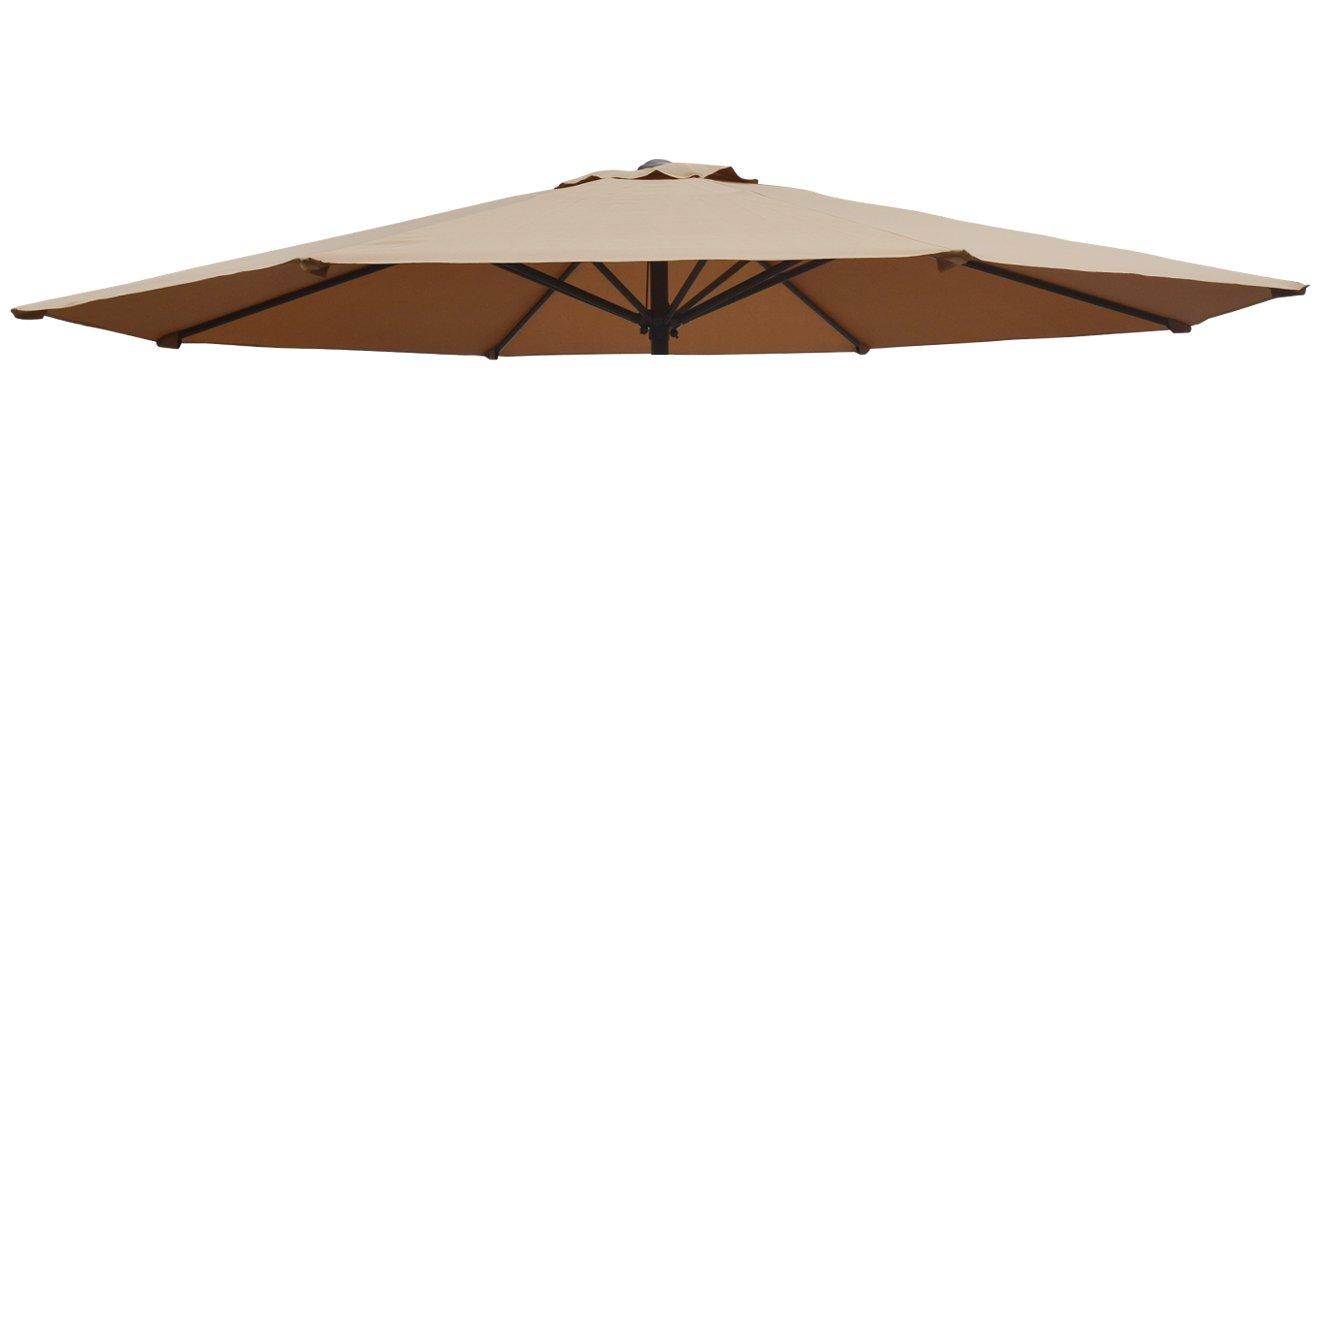 BenefitUSA Umbrella Cover Canopy 13ft 8 Rib Patio Replacement Top Outdoor-tan